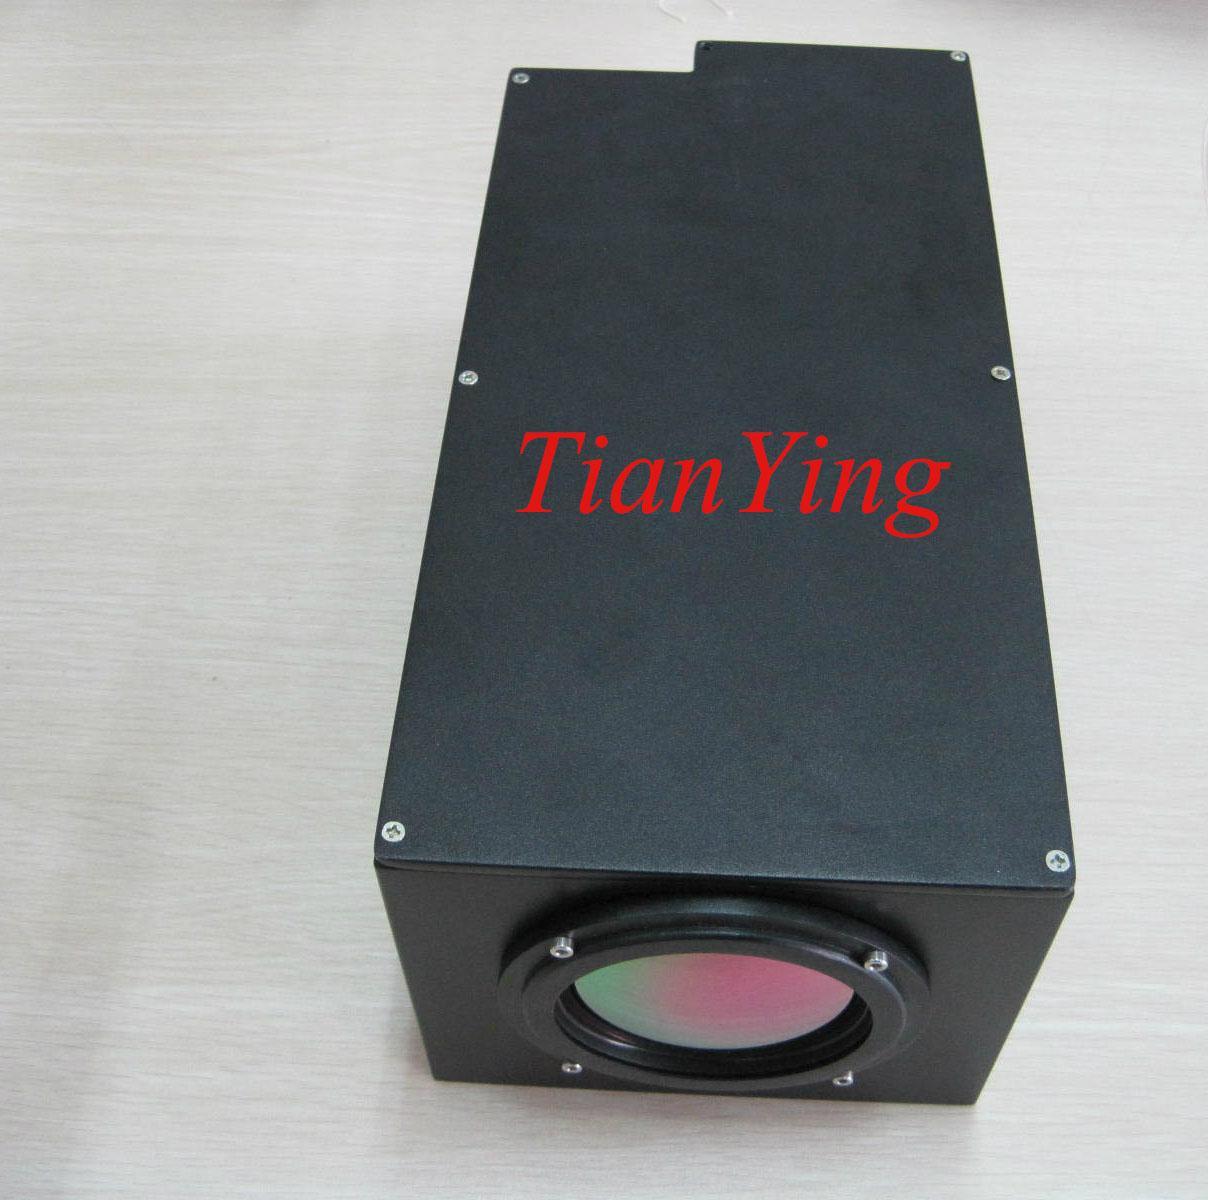 C400 9km/12km Cooled Thermal Imaging Camera